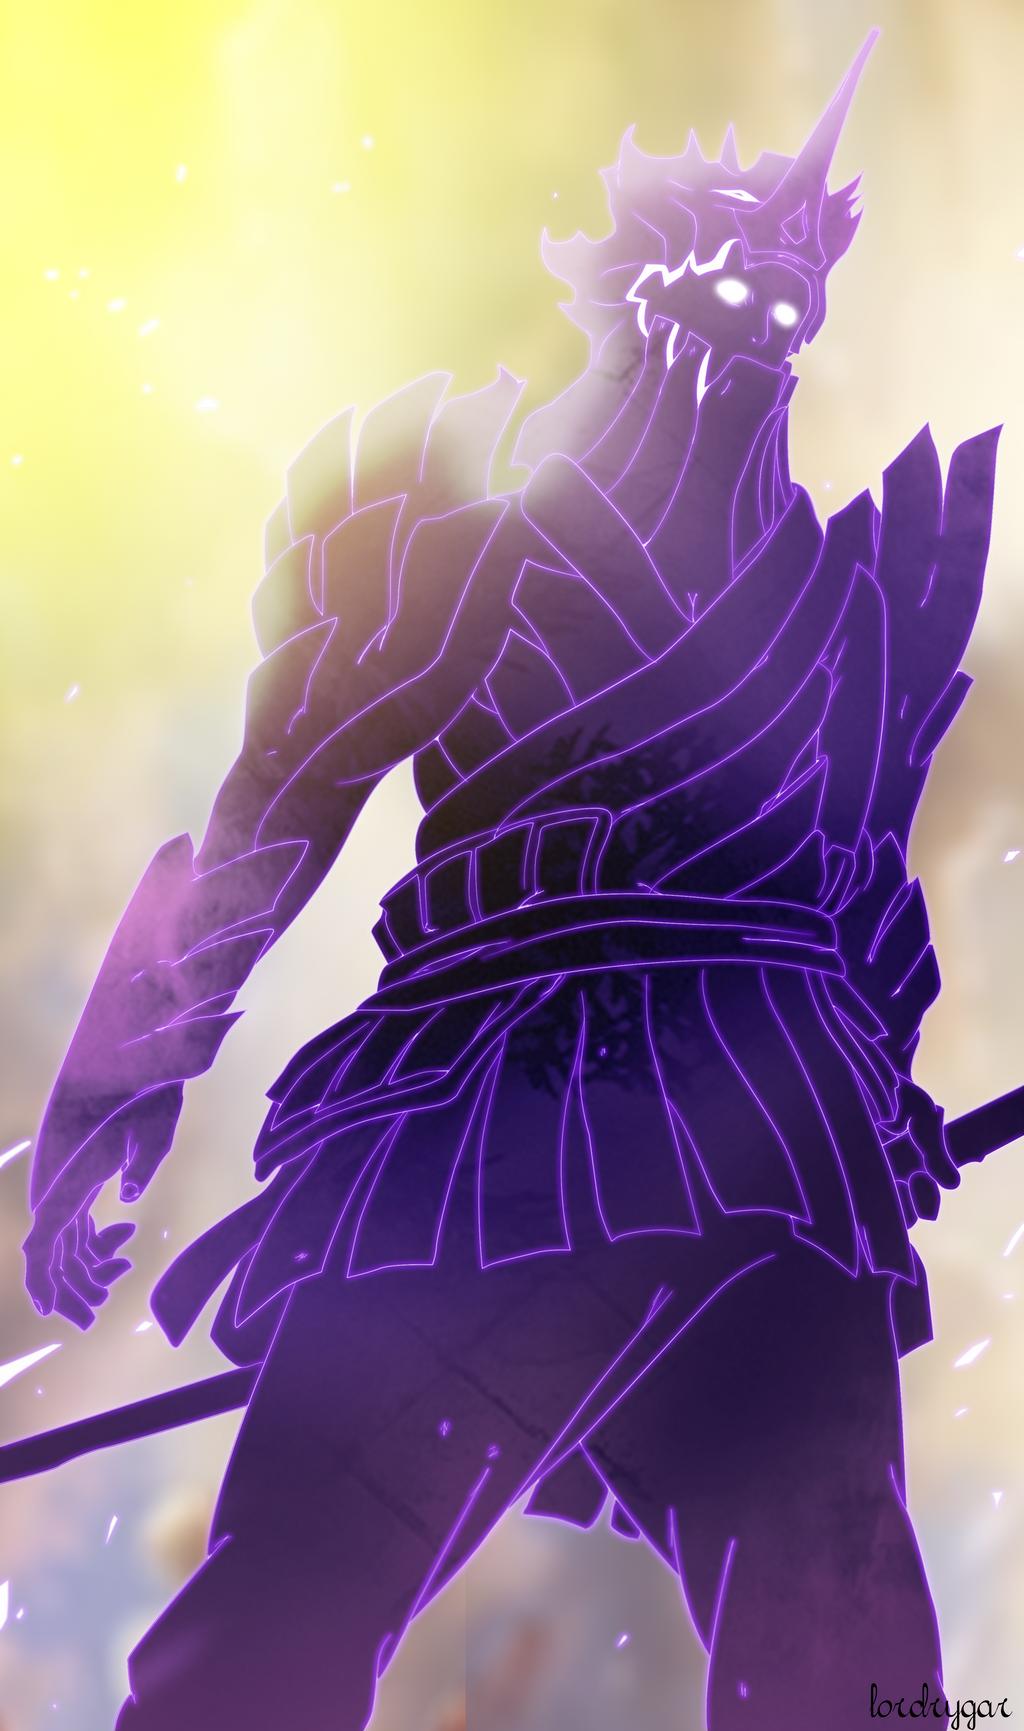 Naruto 696 - Sasuke Absolute Susano by Lordyrgar on DeviantArt